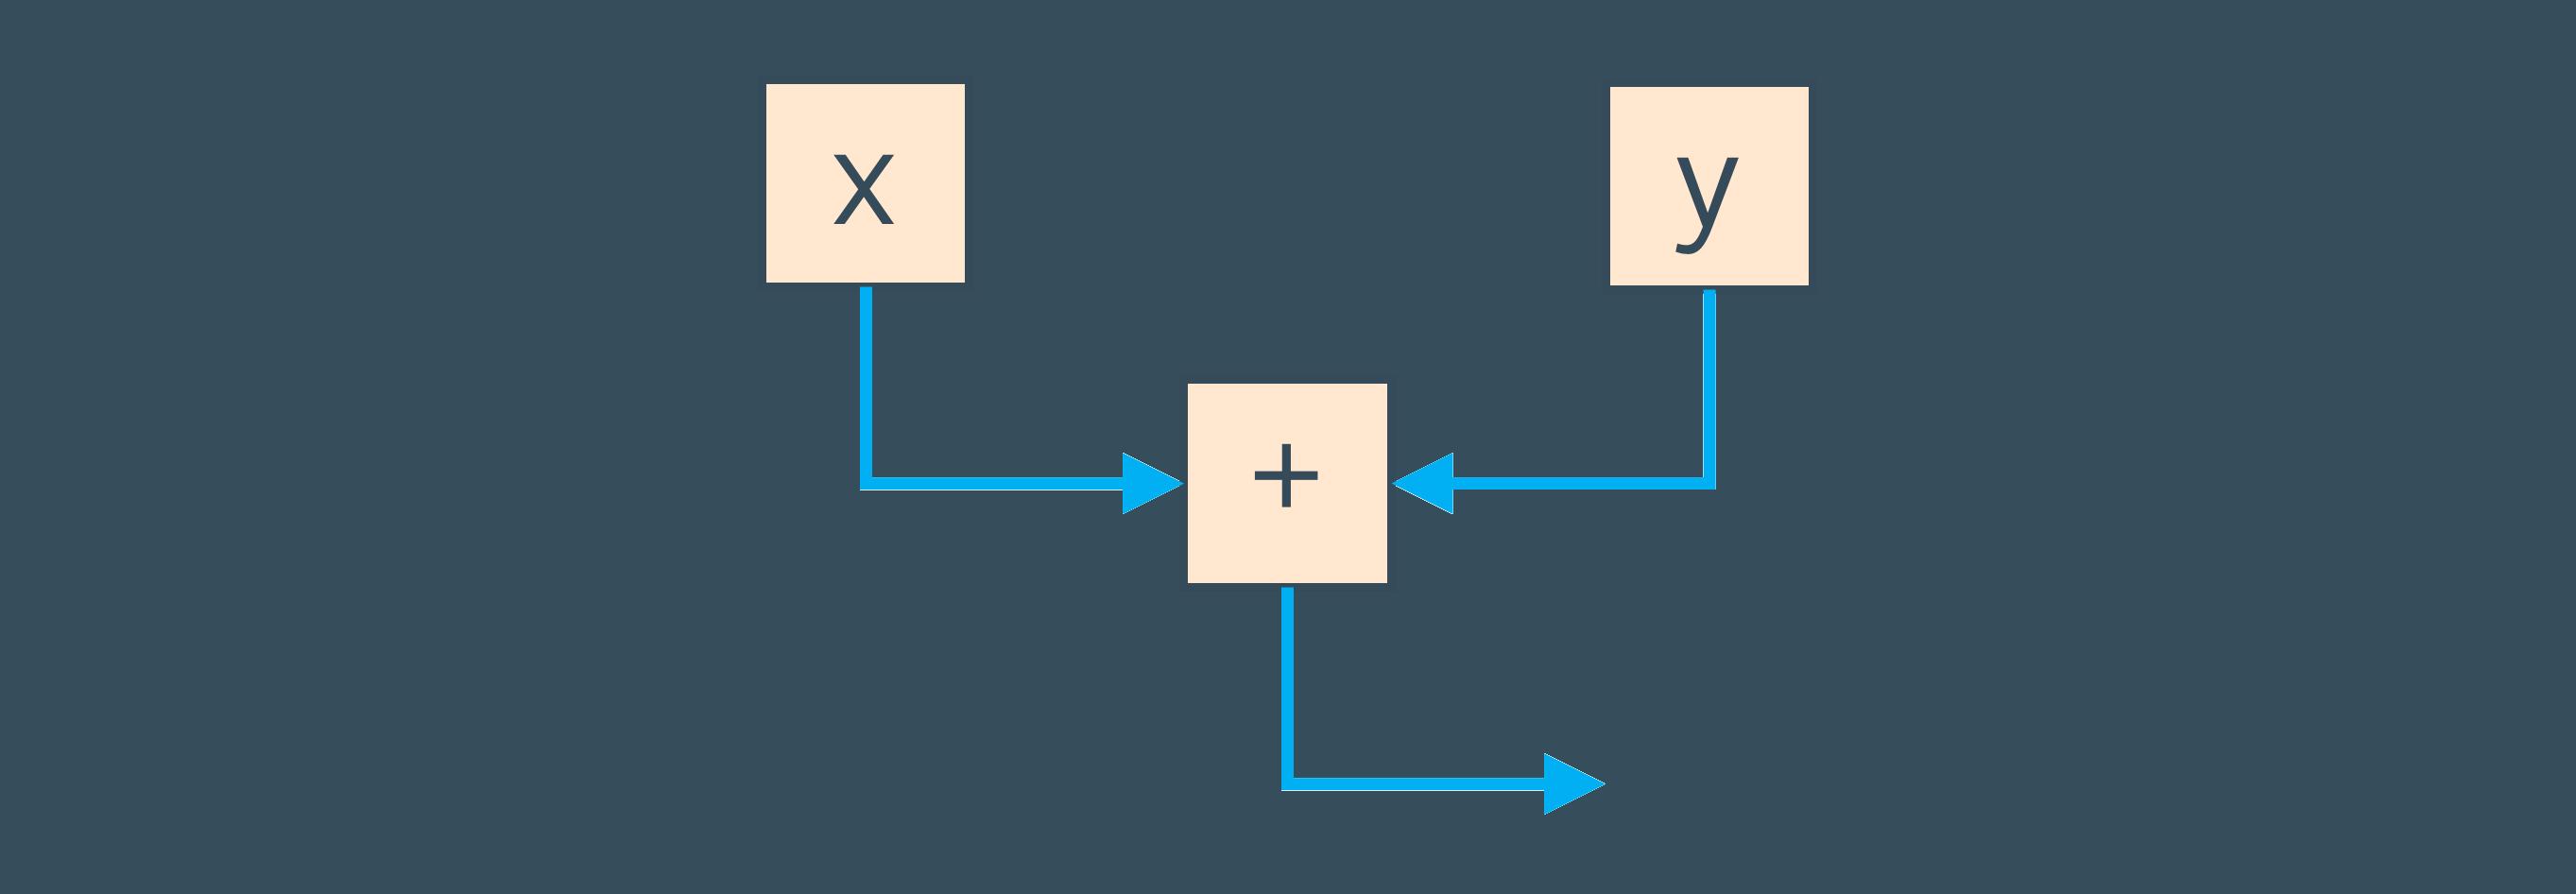 Understanding How Graal Works - a Java JIT Compiler Written